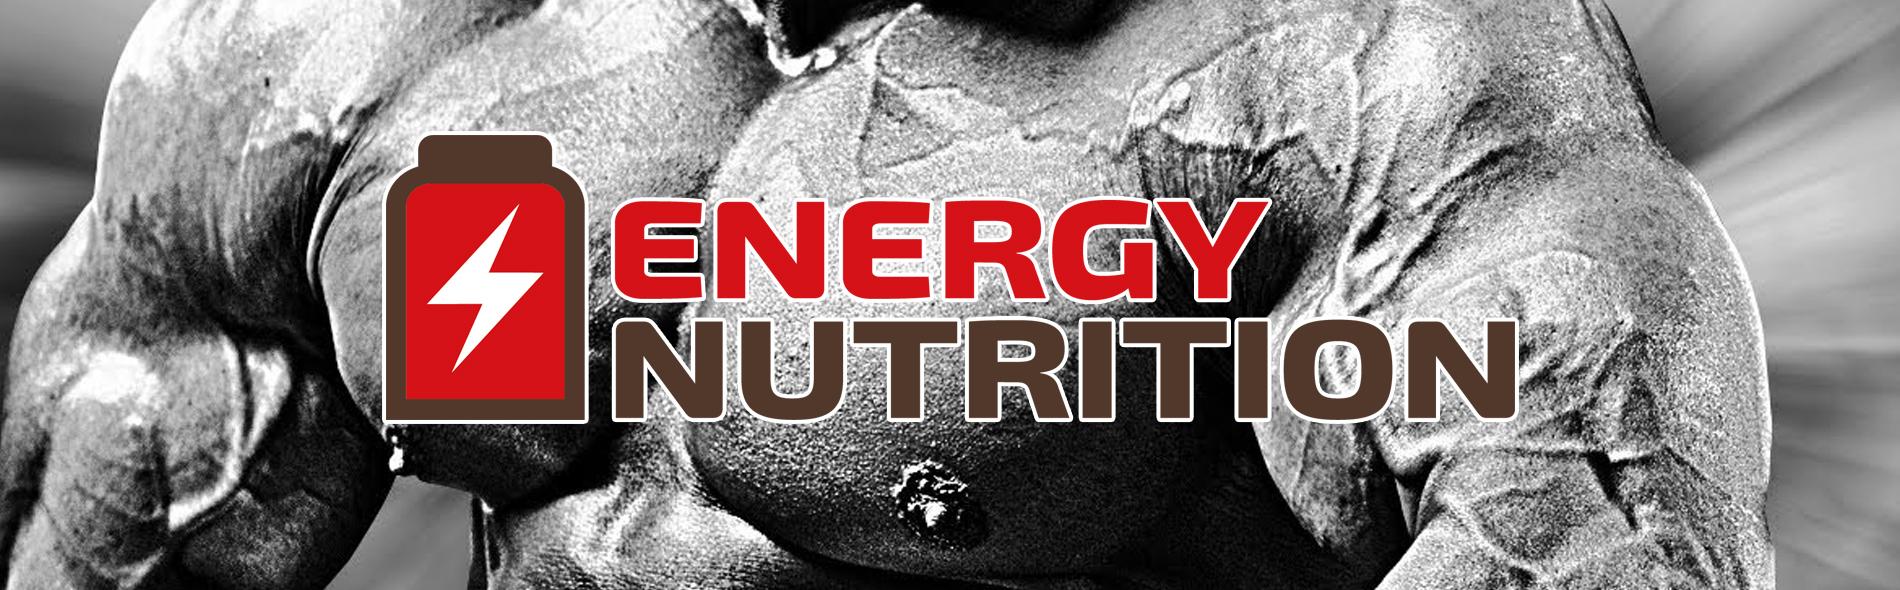 Energy Nutrition